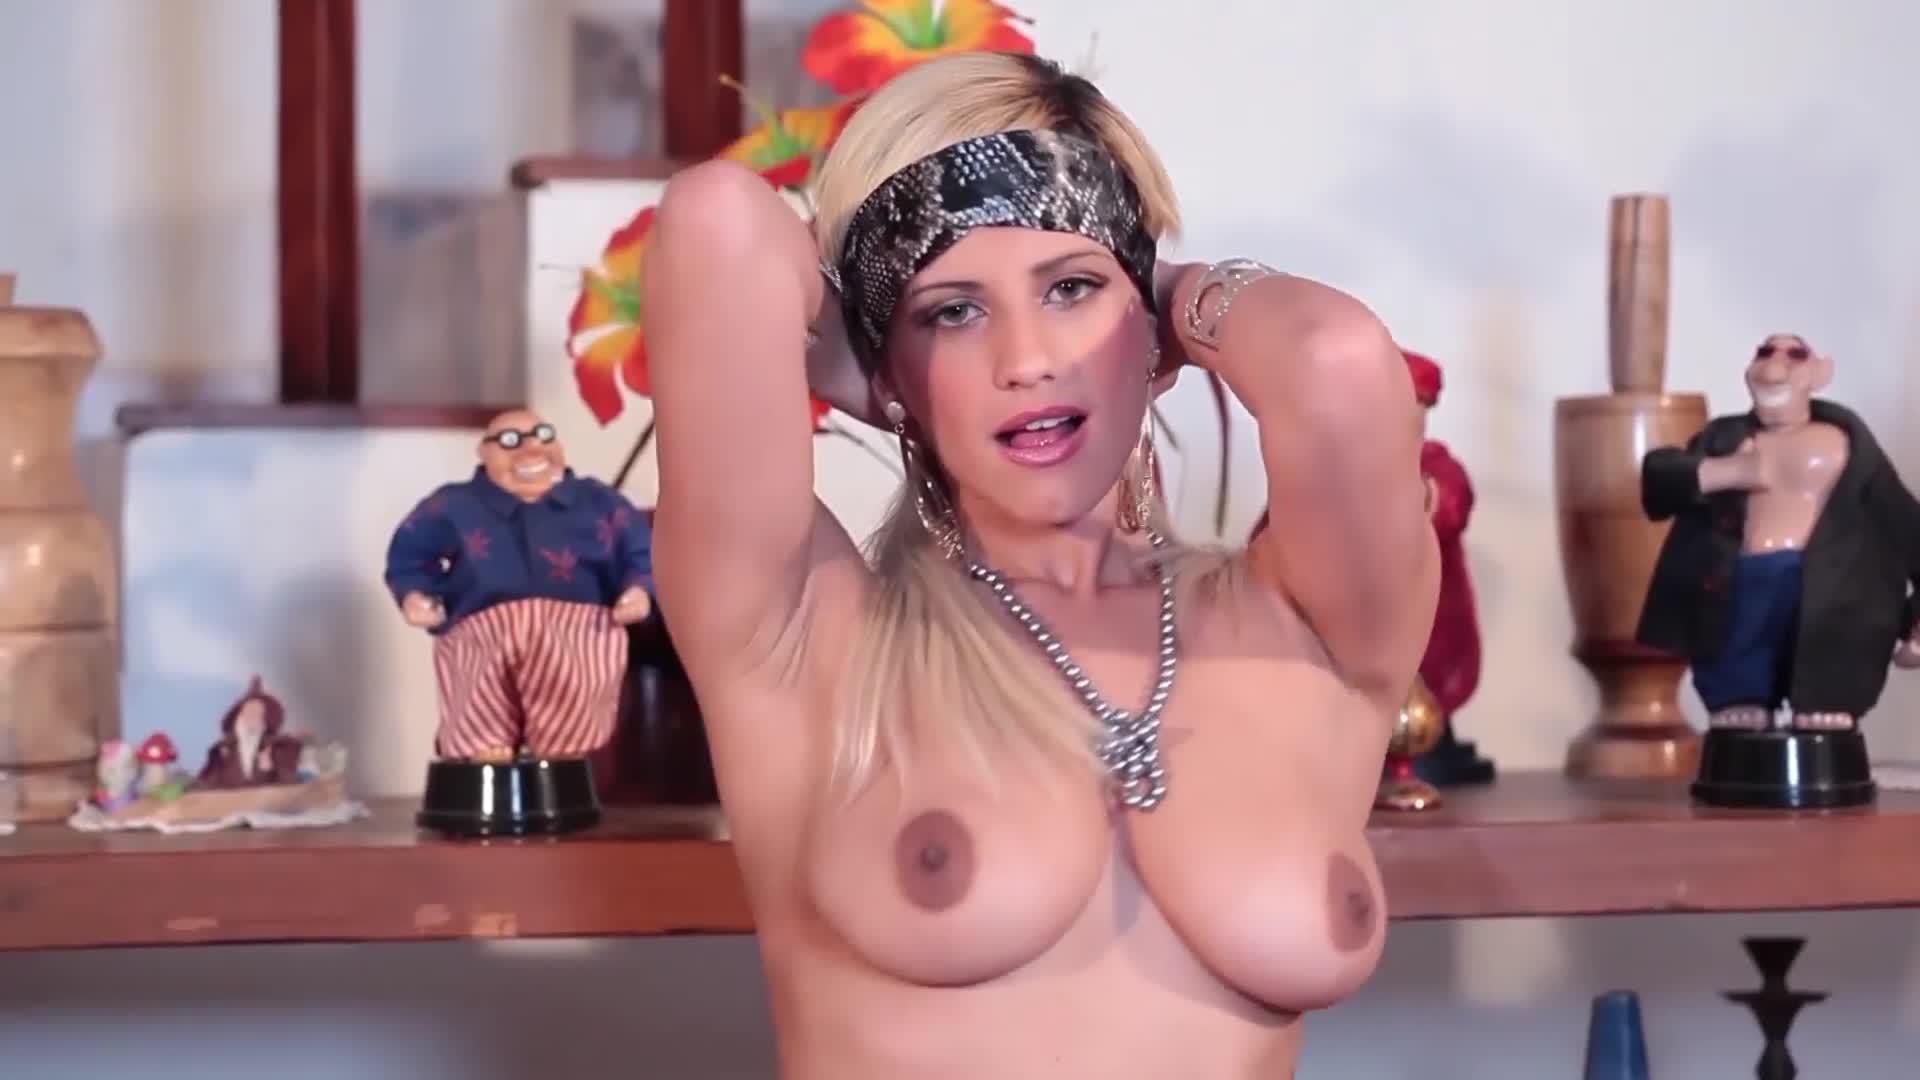 Brazilian Women - Carol Castro